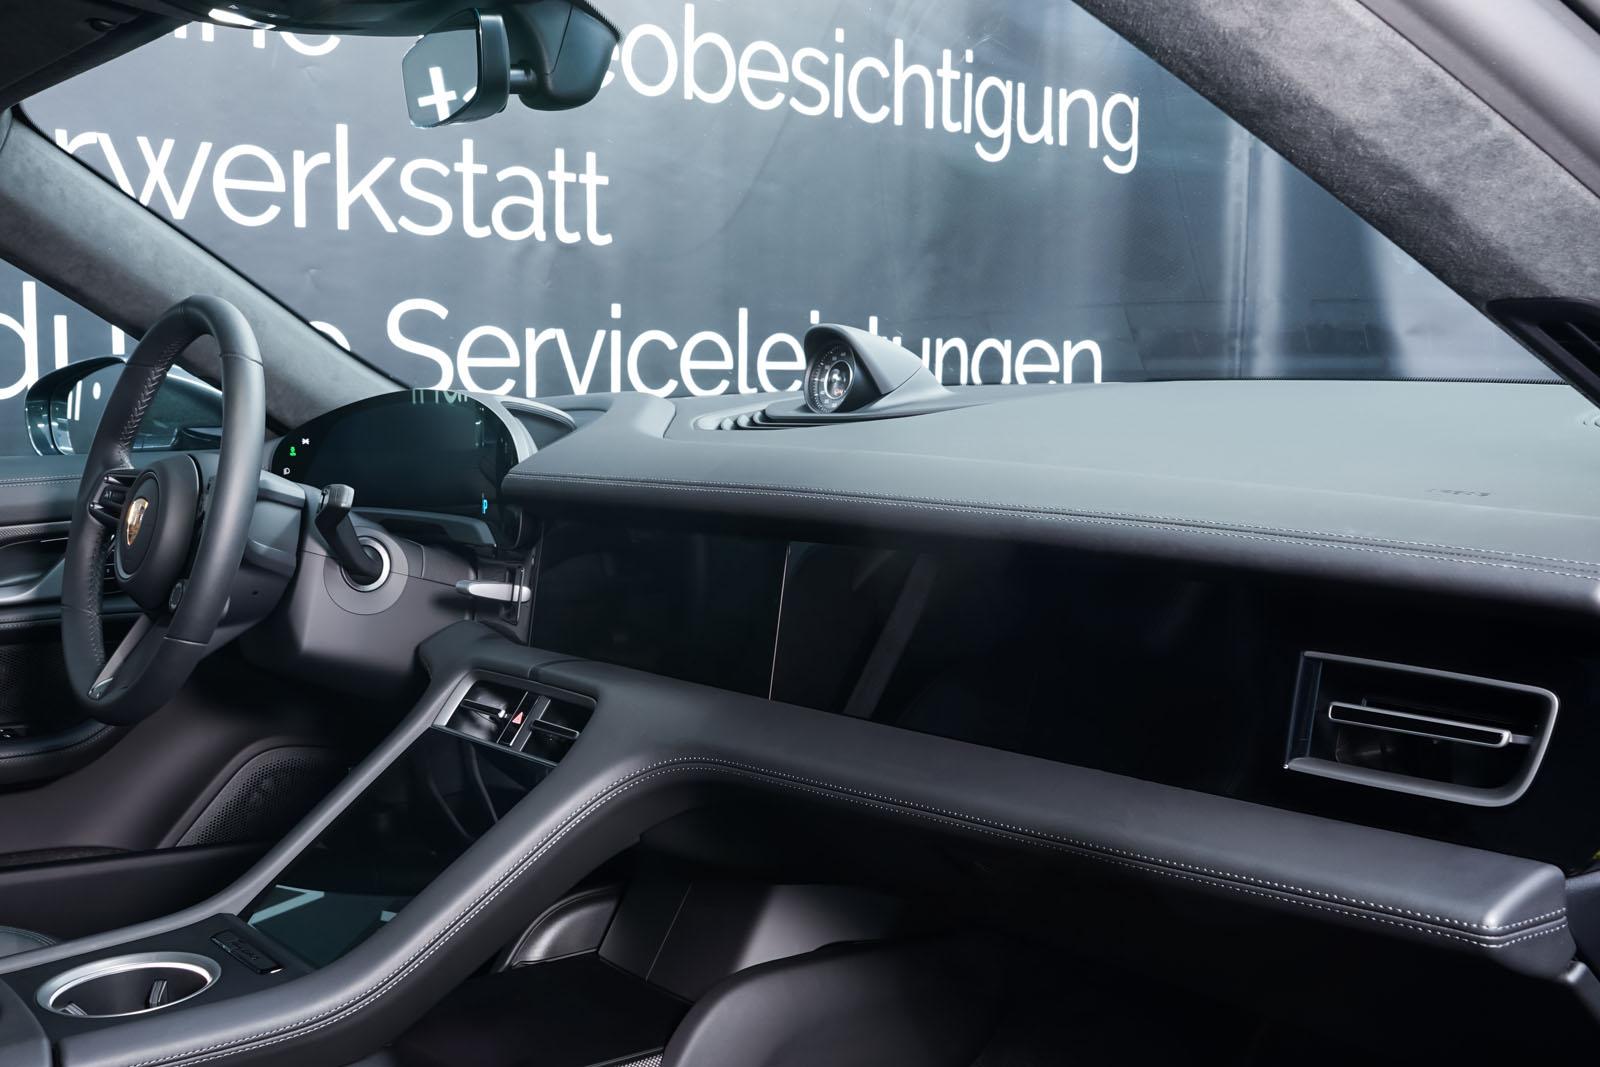 Porsche_Taycan_TurboS_Grau_Schwarz_POR-5353_20_w